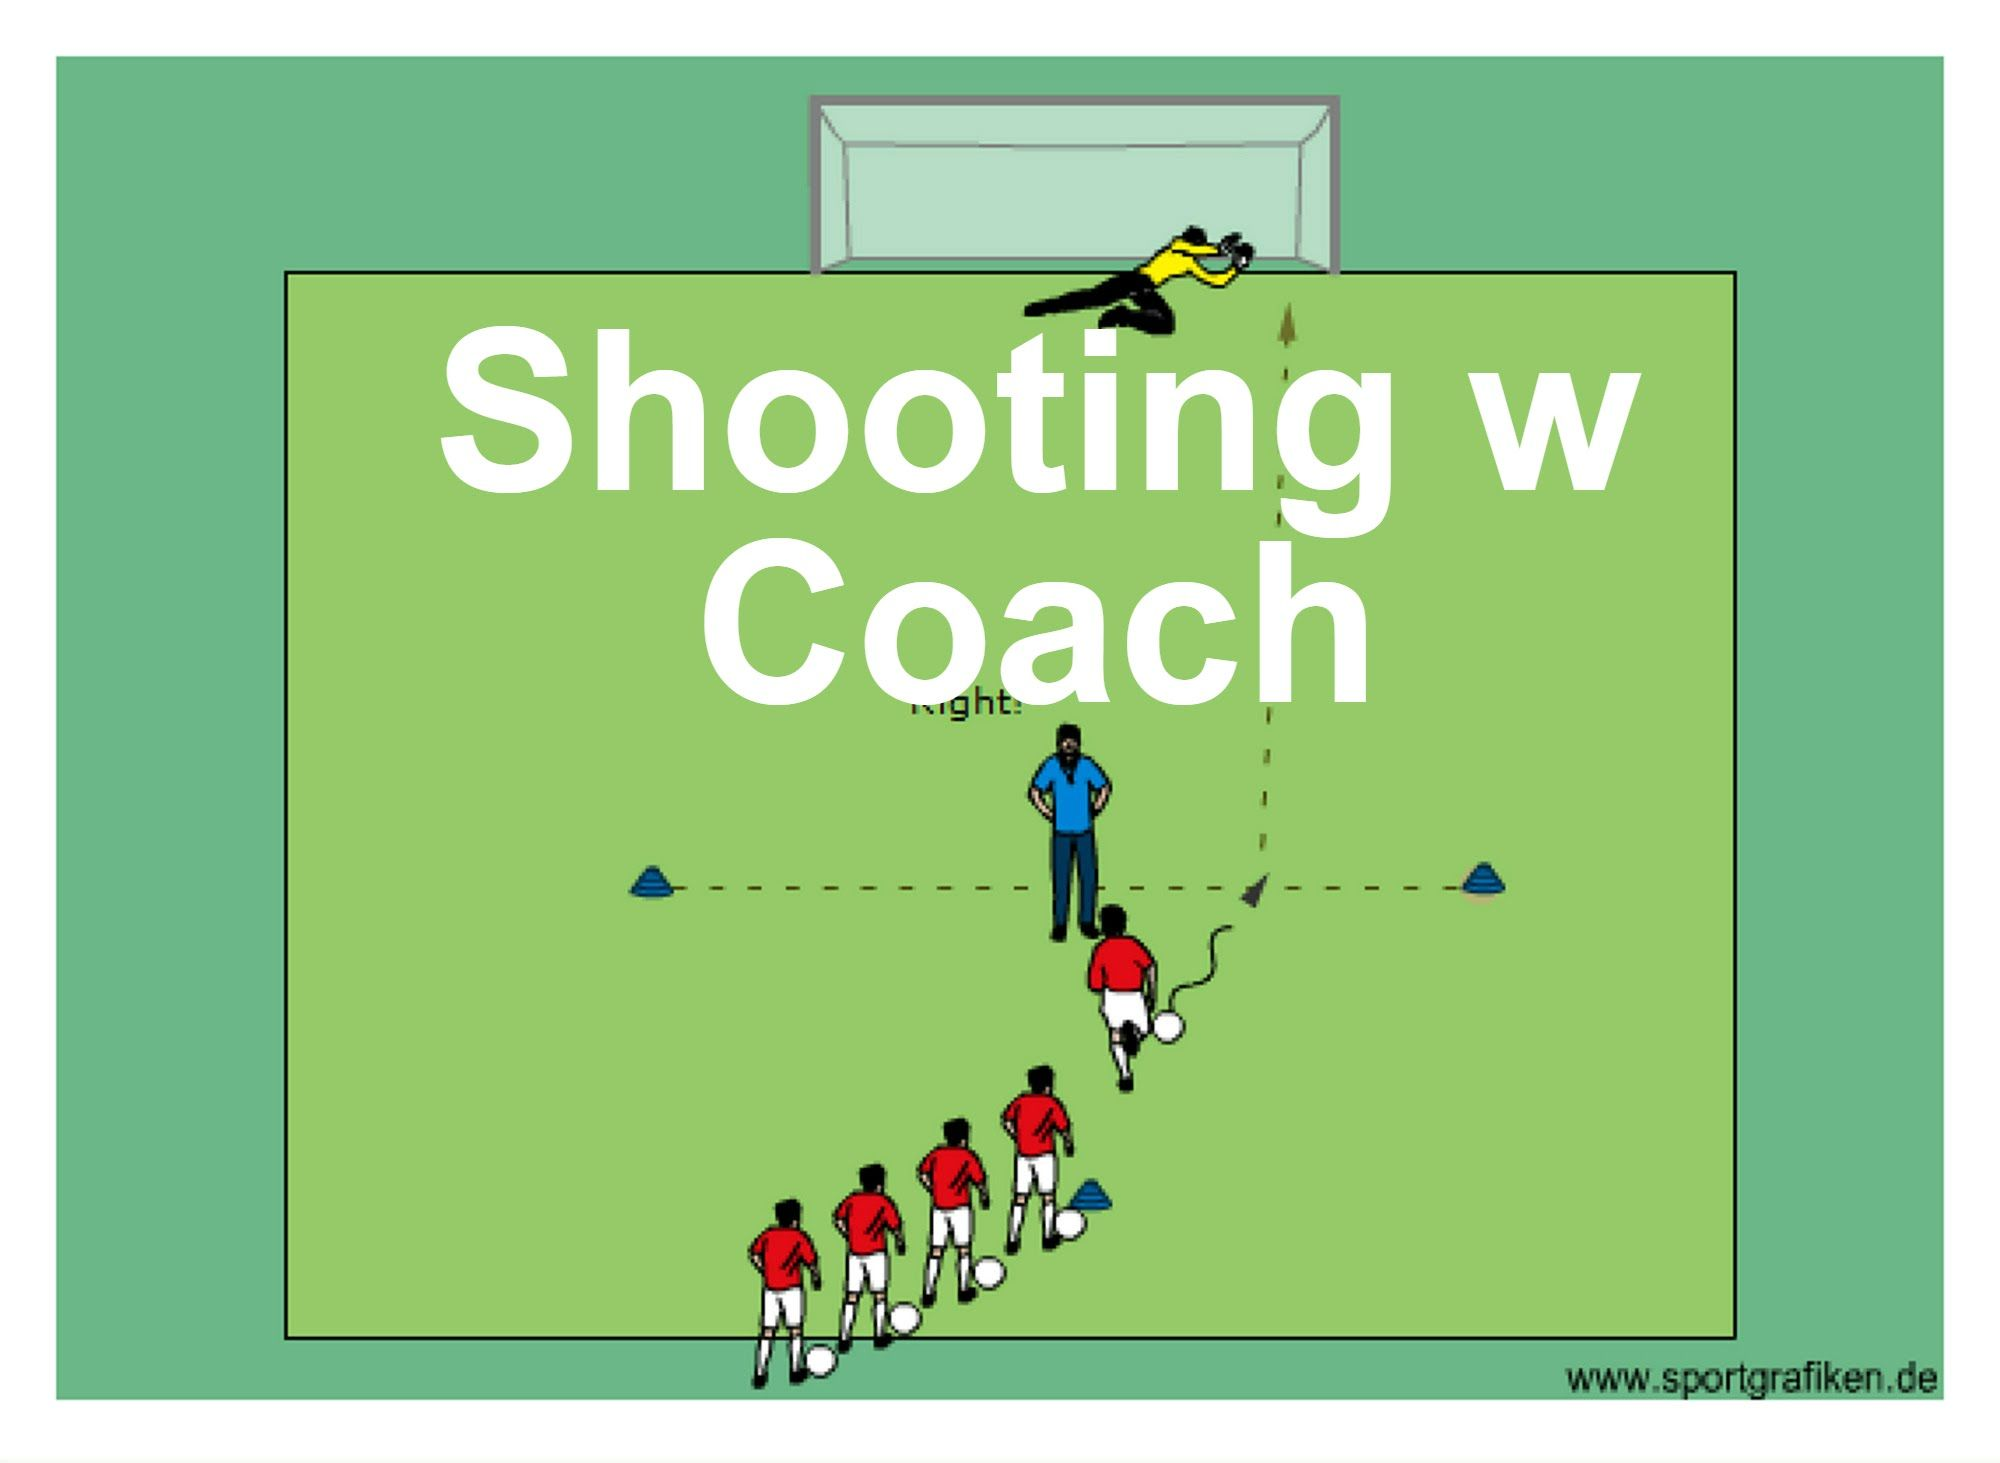 U8 Soccer Shooting Drills For Training Soccer Drills For Kids Soccer Shooting Drills Soccer Drills